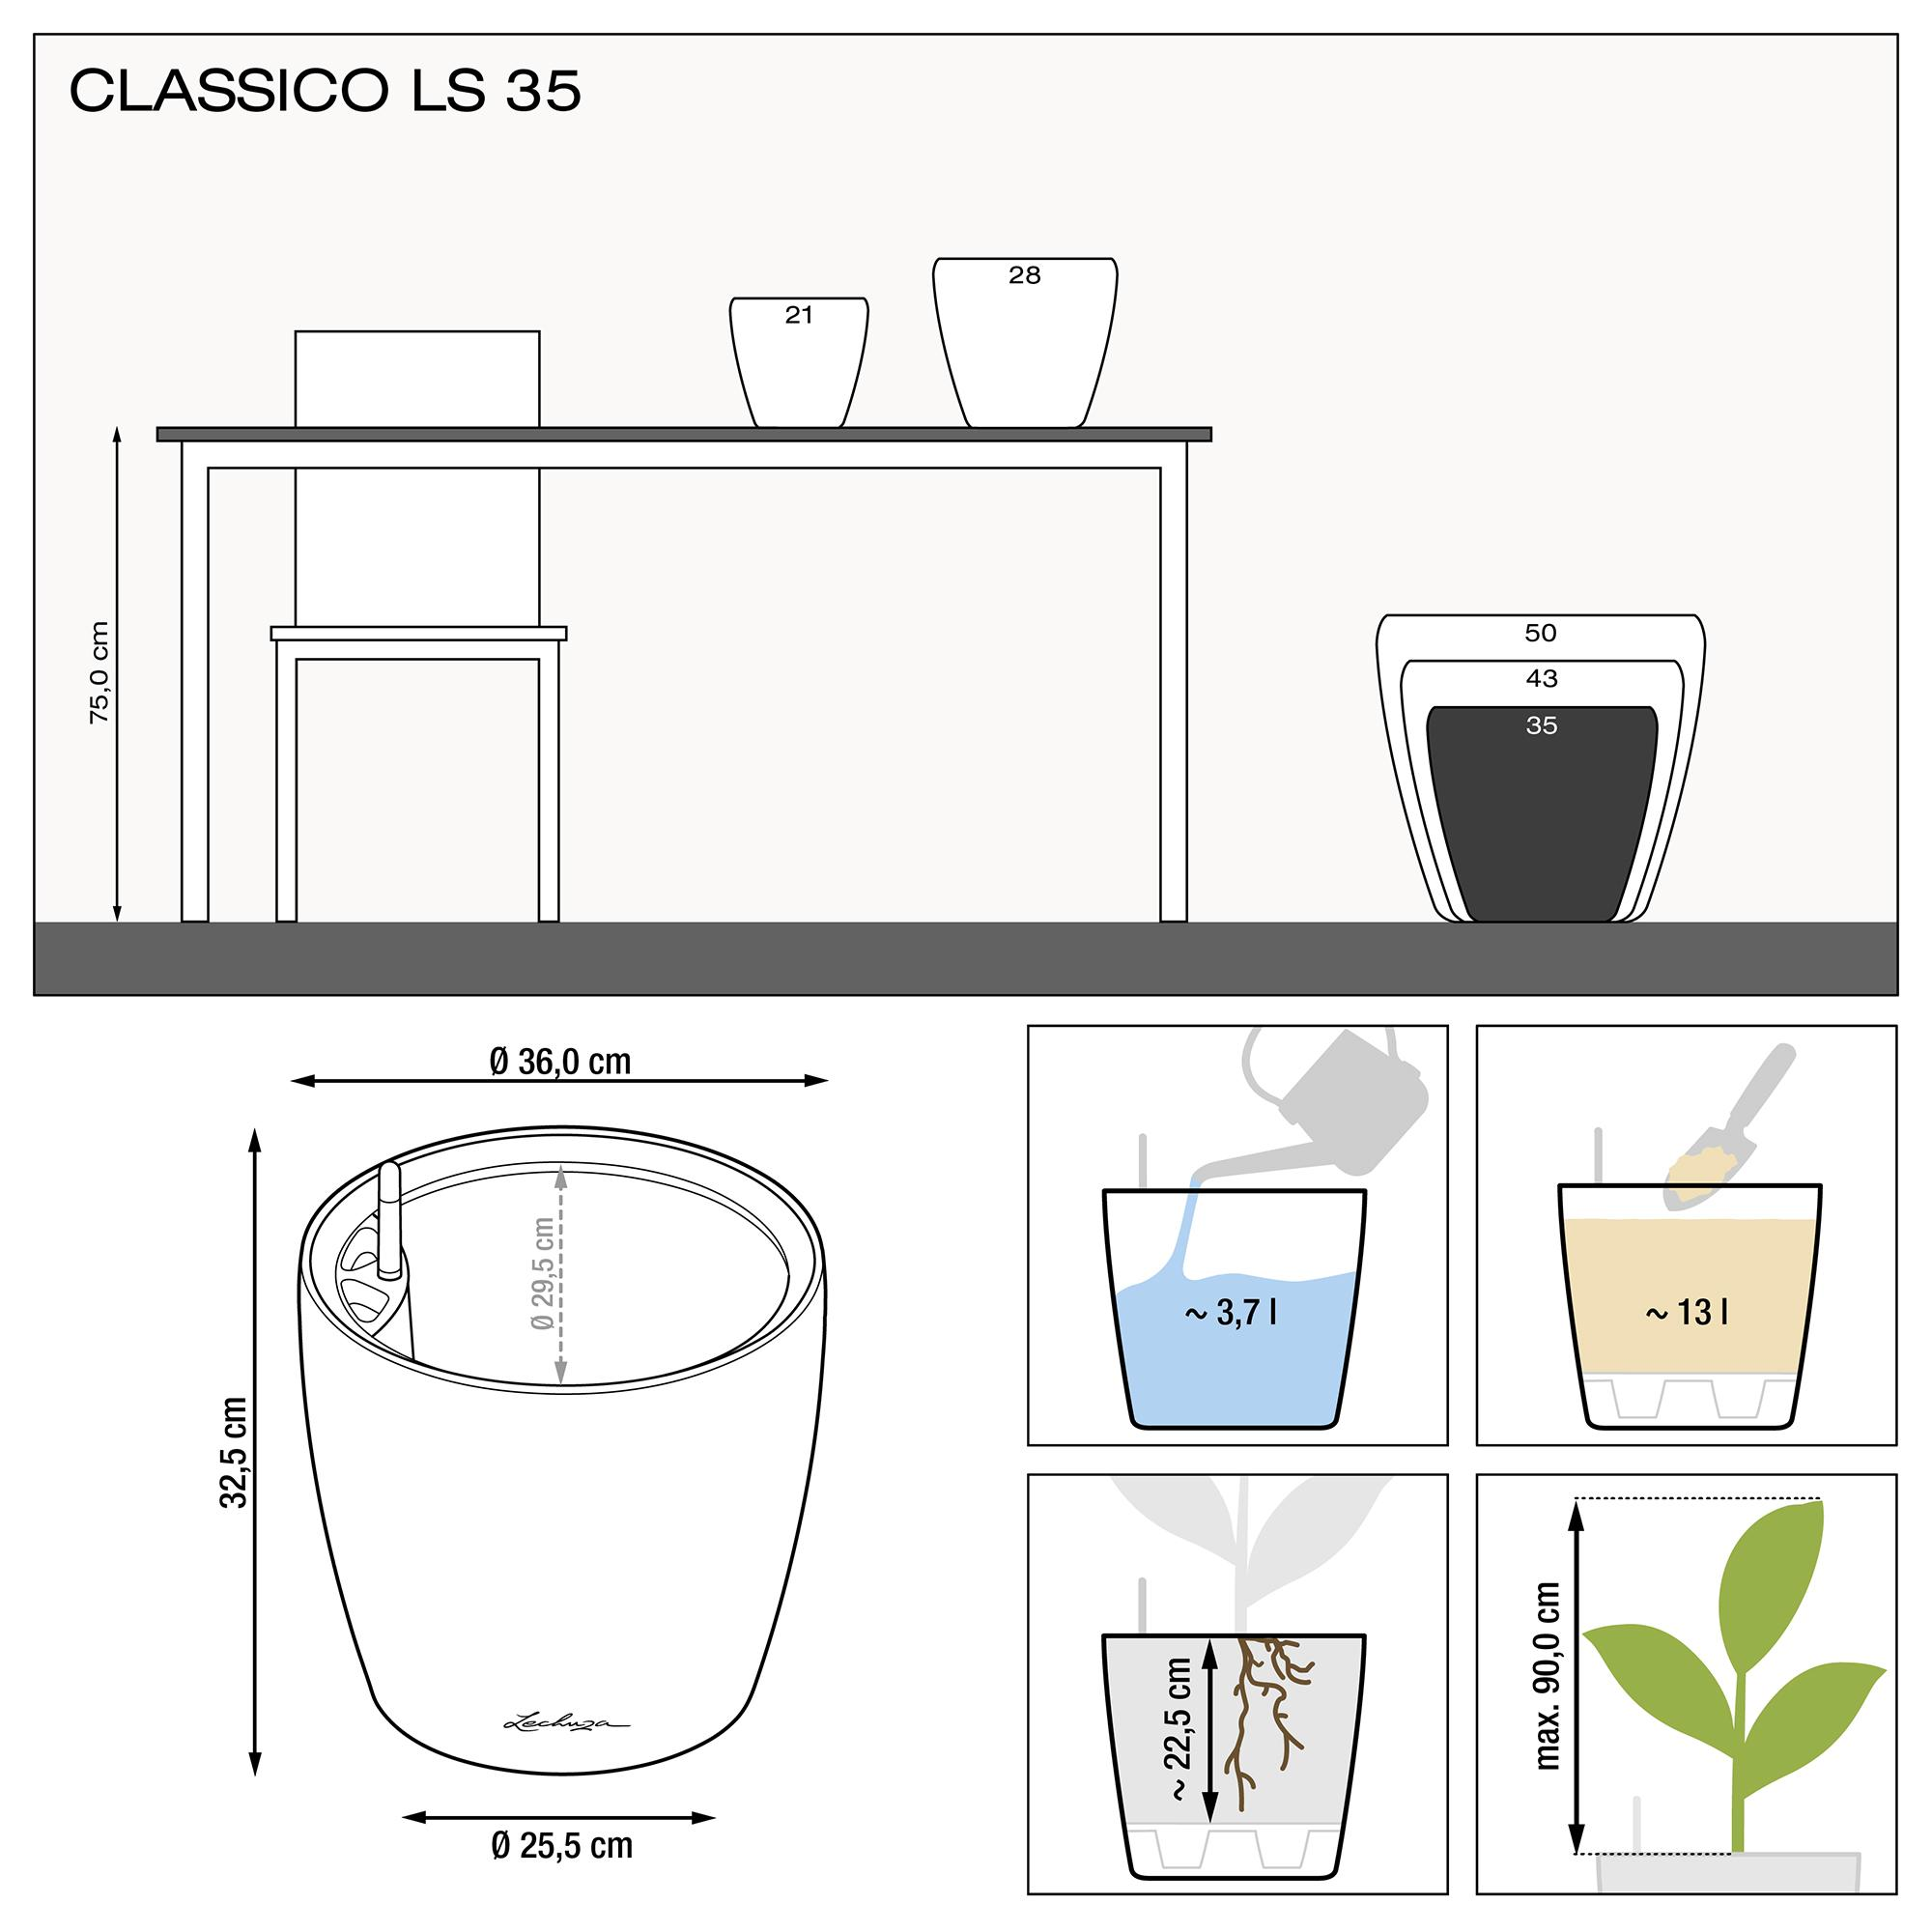 CLASSICO LS 35 antraciet metallic - Image 3